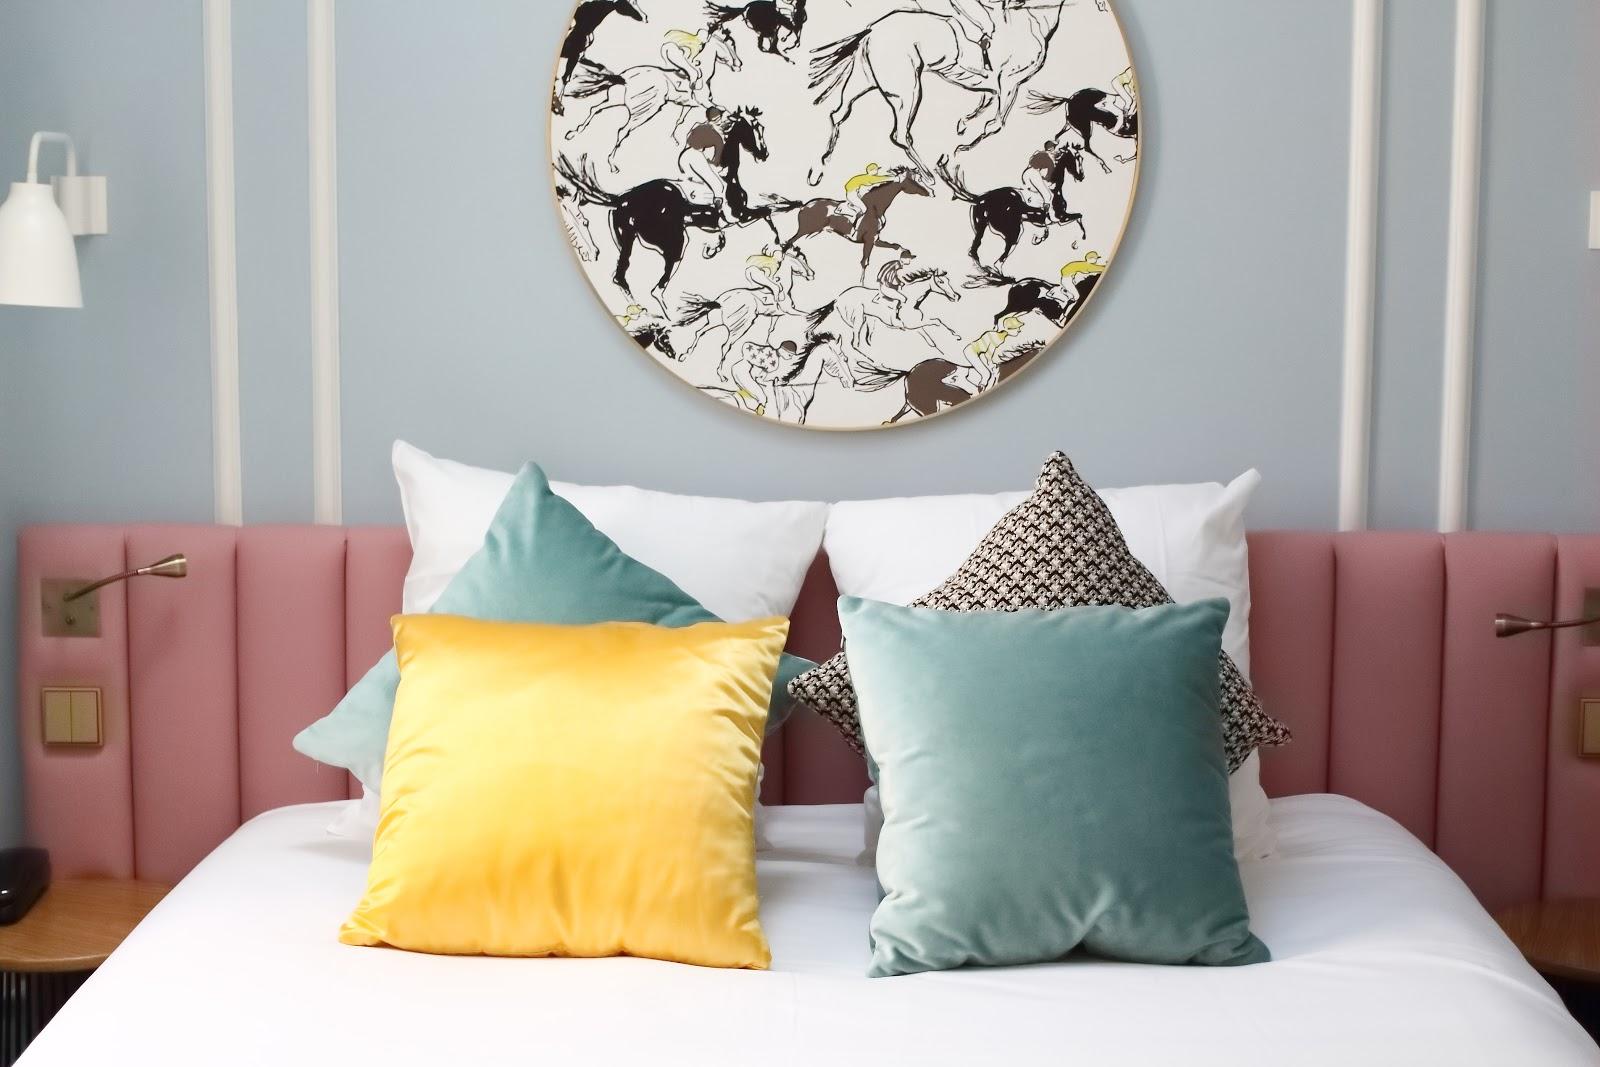 Hotel, Pastel, Paris, Review, Room, Decor, Arc De Triomphe, 3 Star, Good, Nice